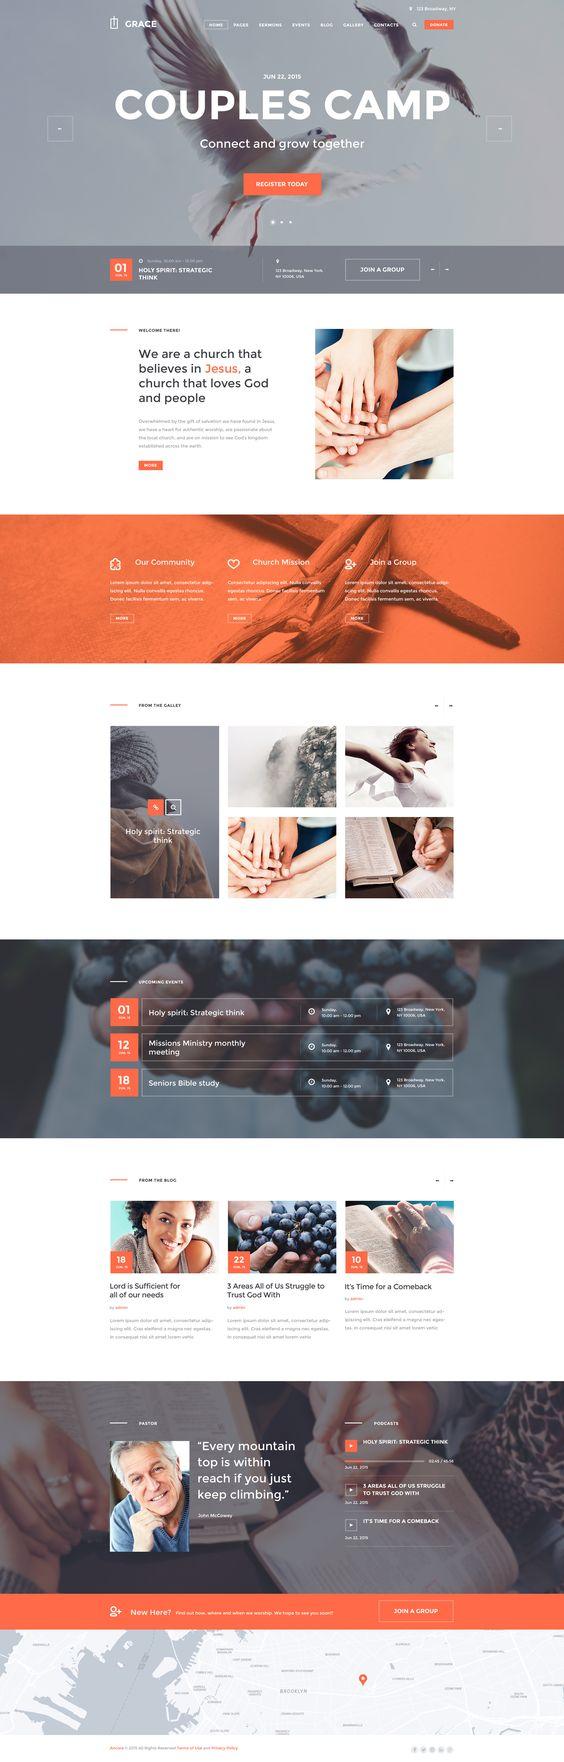 church website design ideas dental lab website design grace is built